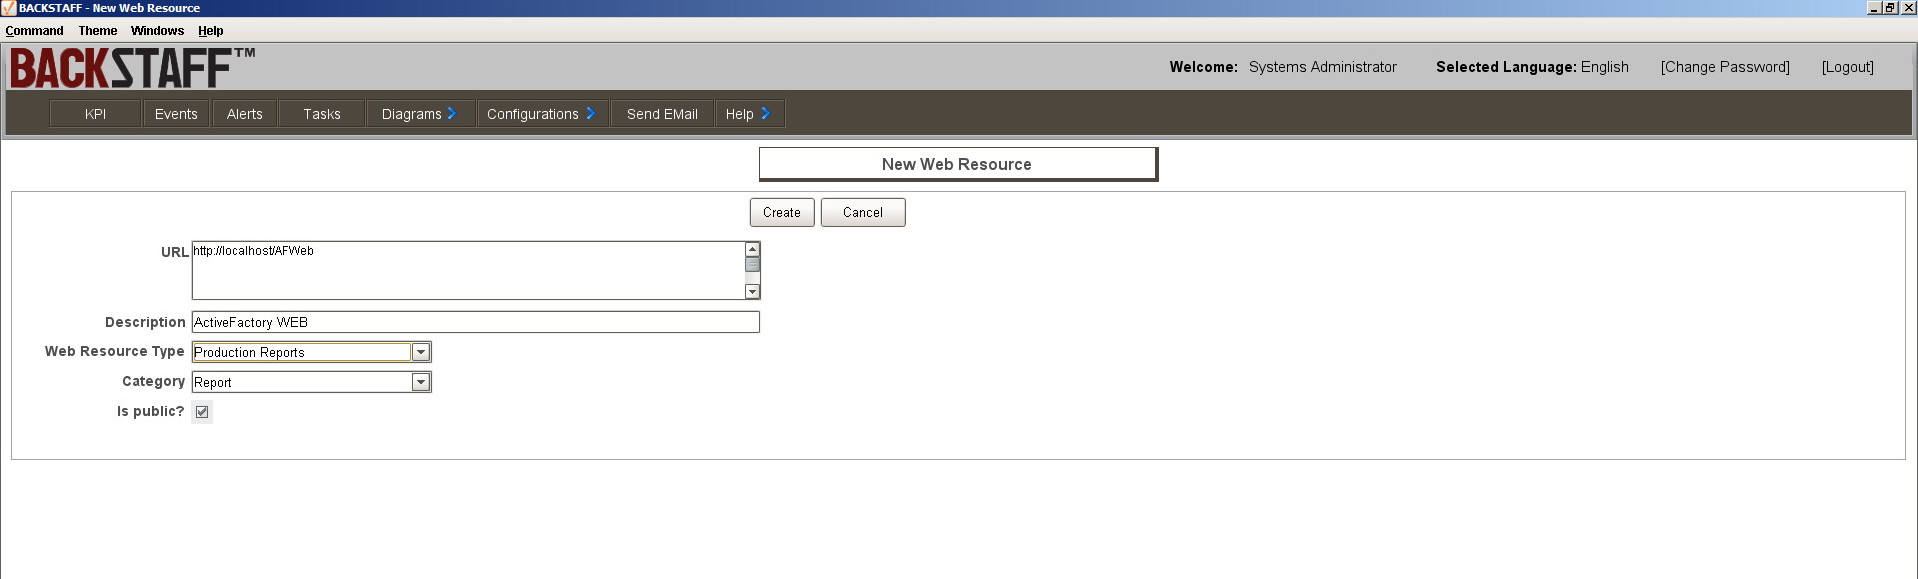 Report configuration from Wonderware Historian